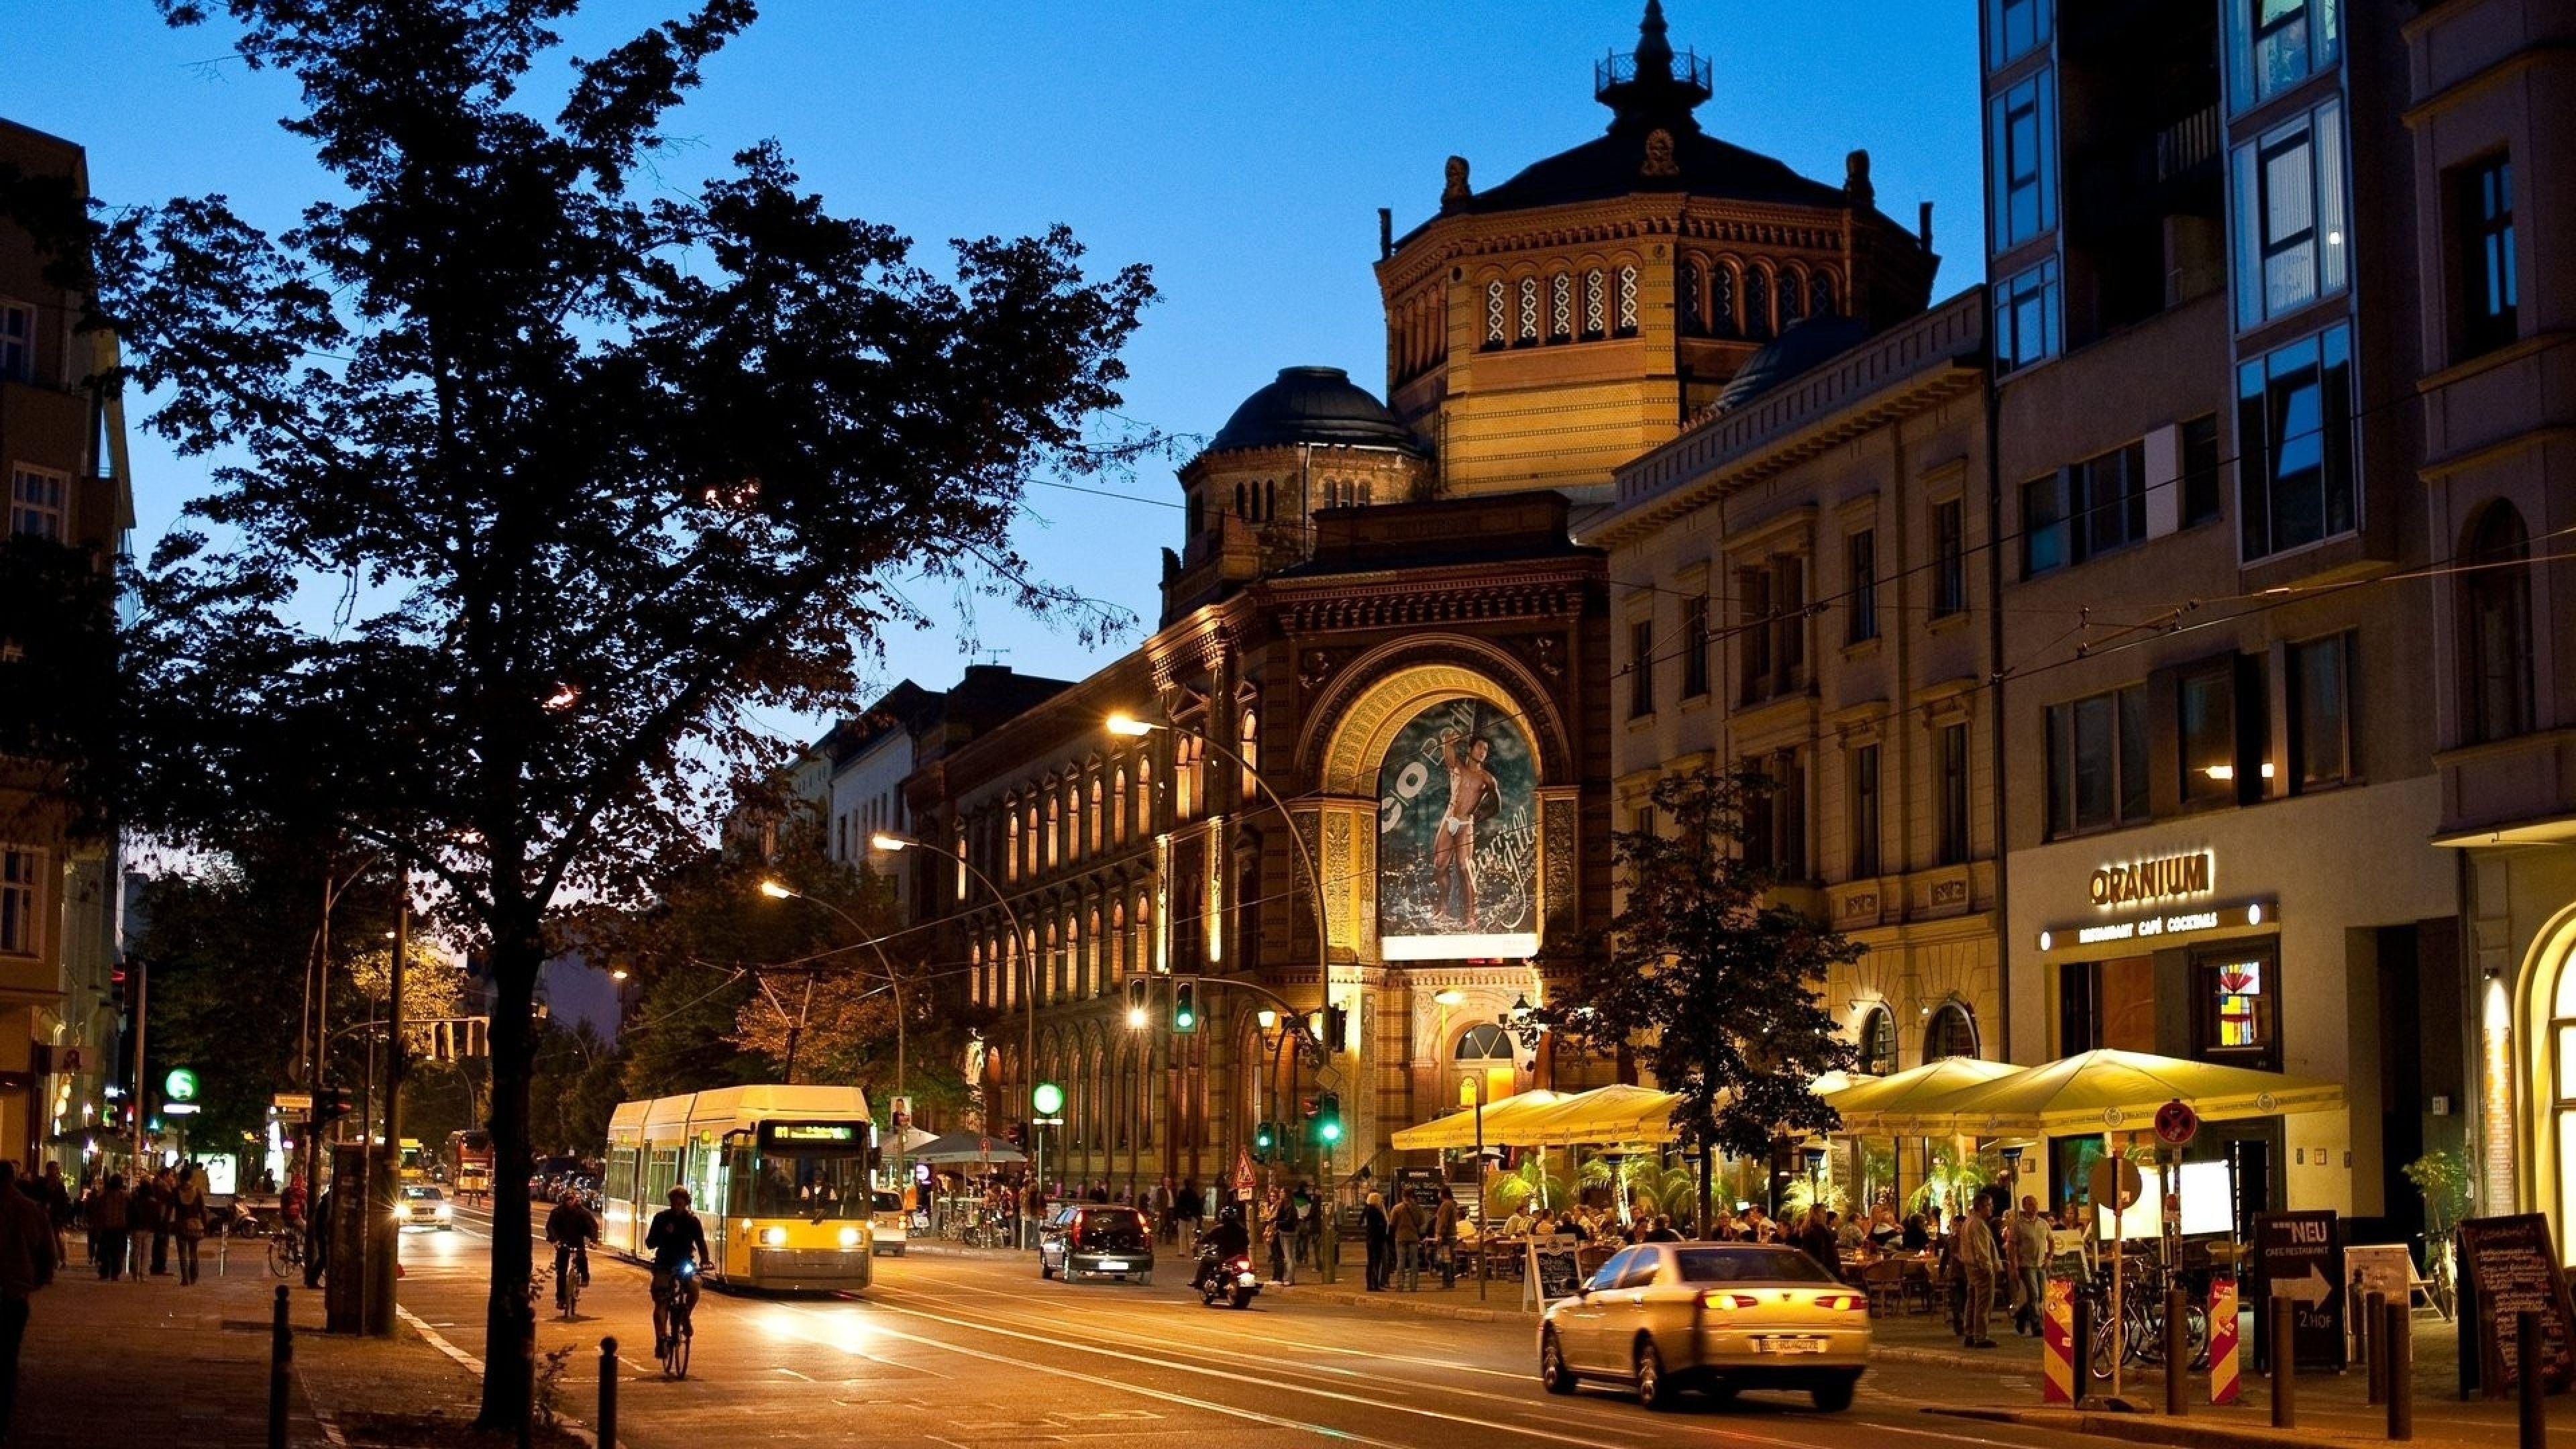 Download Wallpaper 3840x2160 Barcelona, city, Building, Street ...